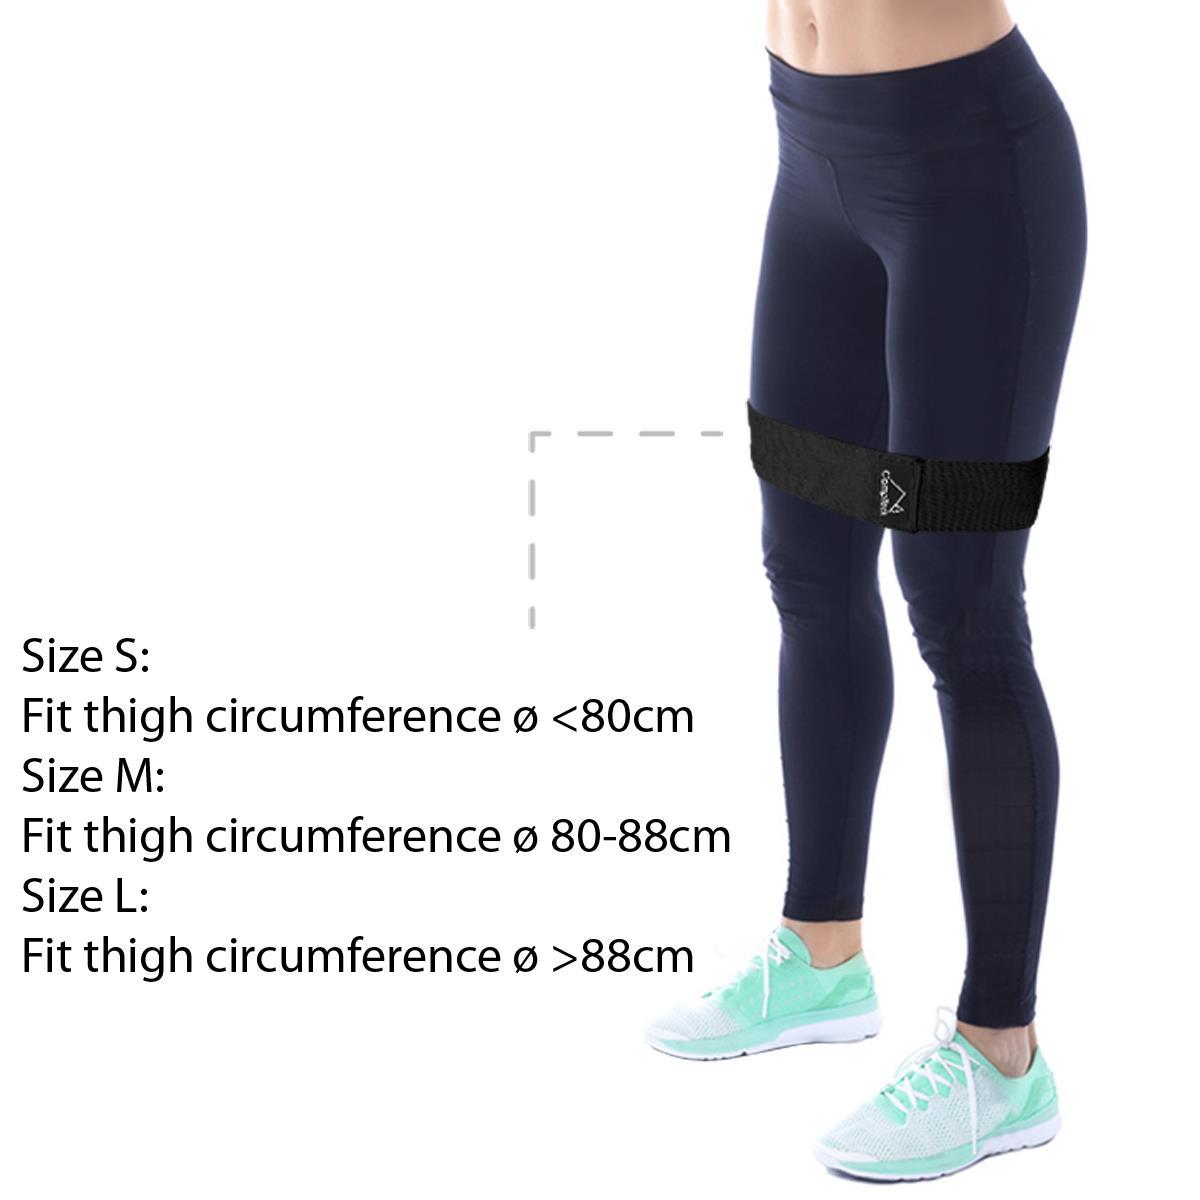 Hip-Band-Circle-Loop-Rotation-Glute-Resistance-Thrust-Leg-Squat-Gym-Exercise miniatuur 8